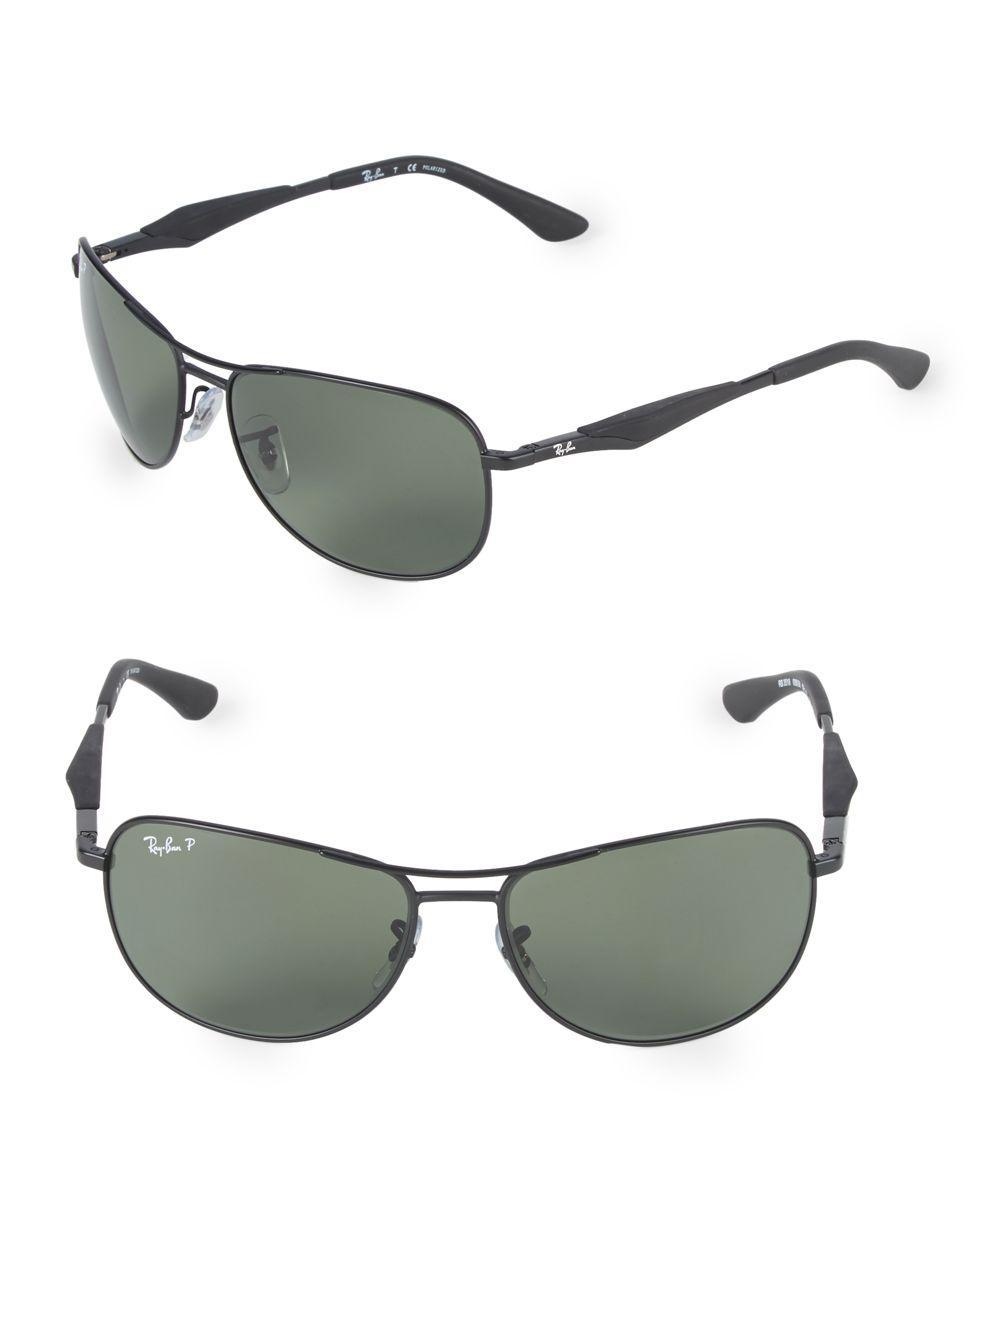 db2eae4bd79 Ray-Ban 59mm Polarized Pilot Sunglasses in Black - Lyst